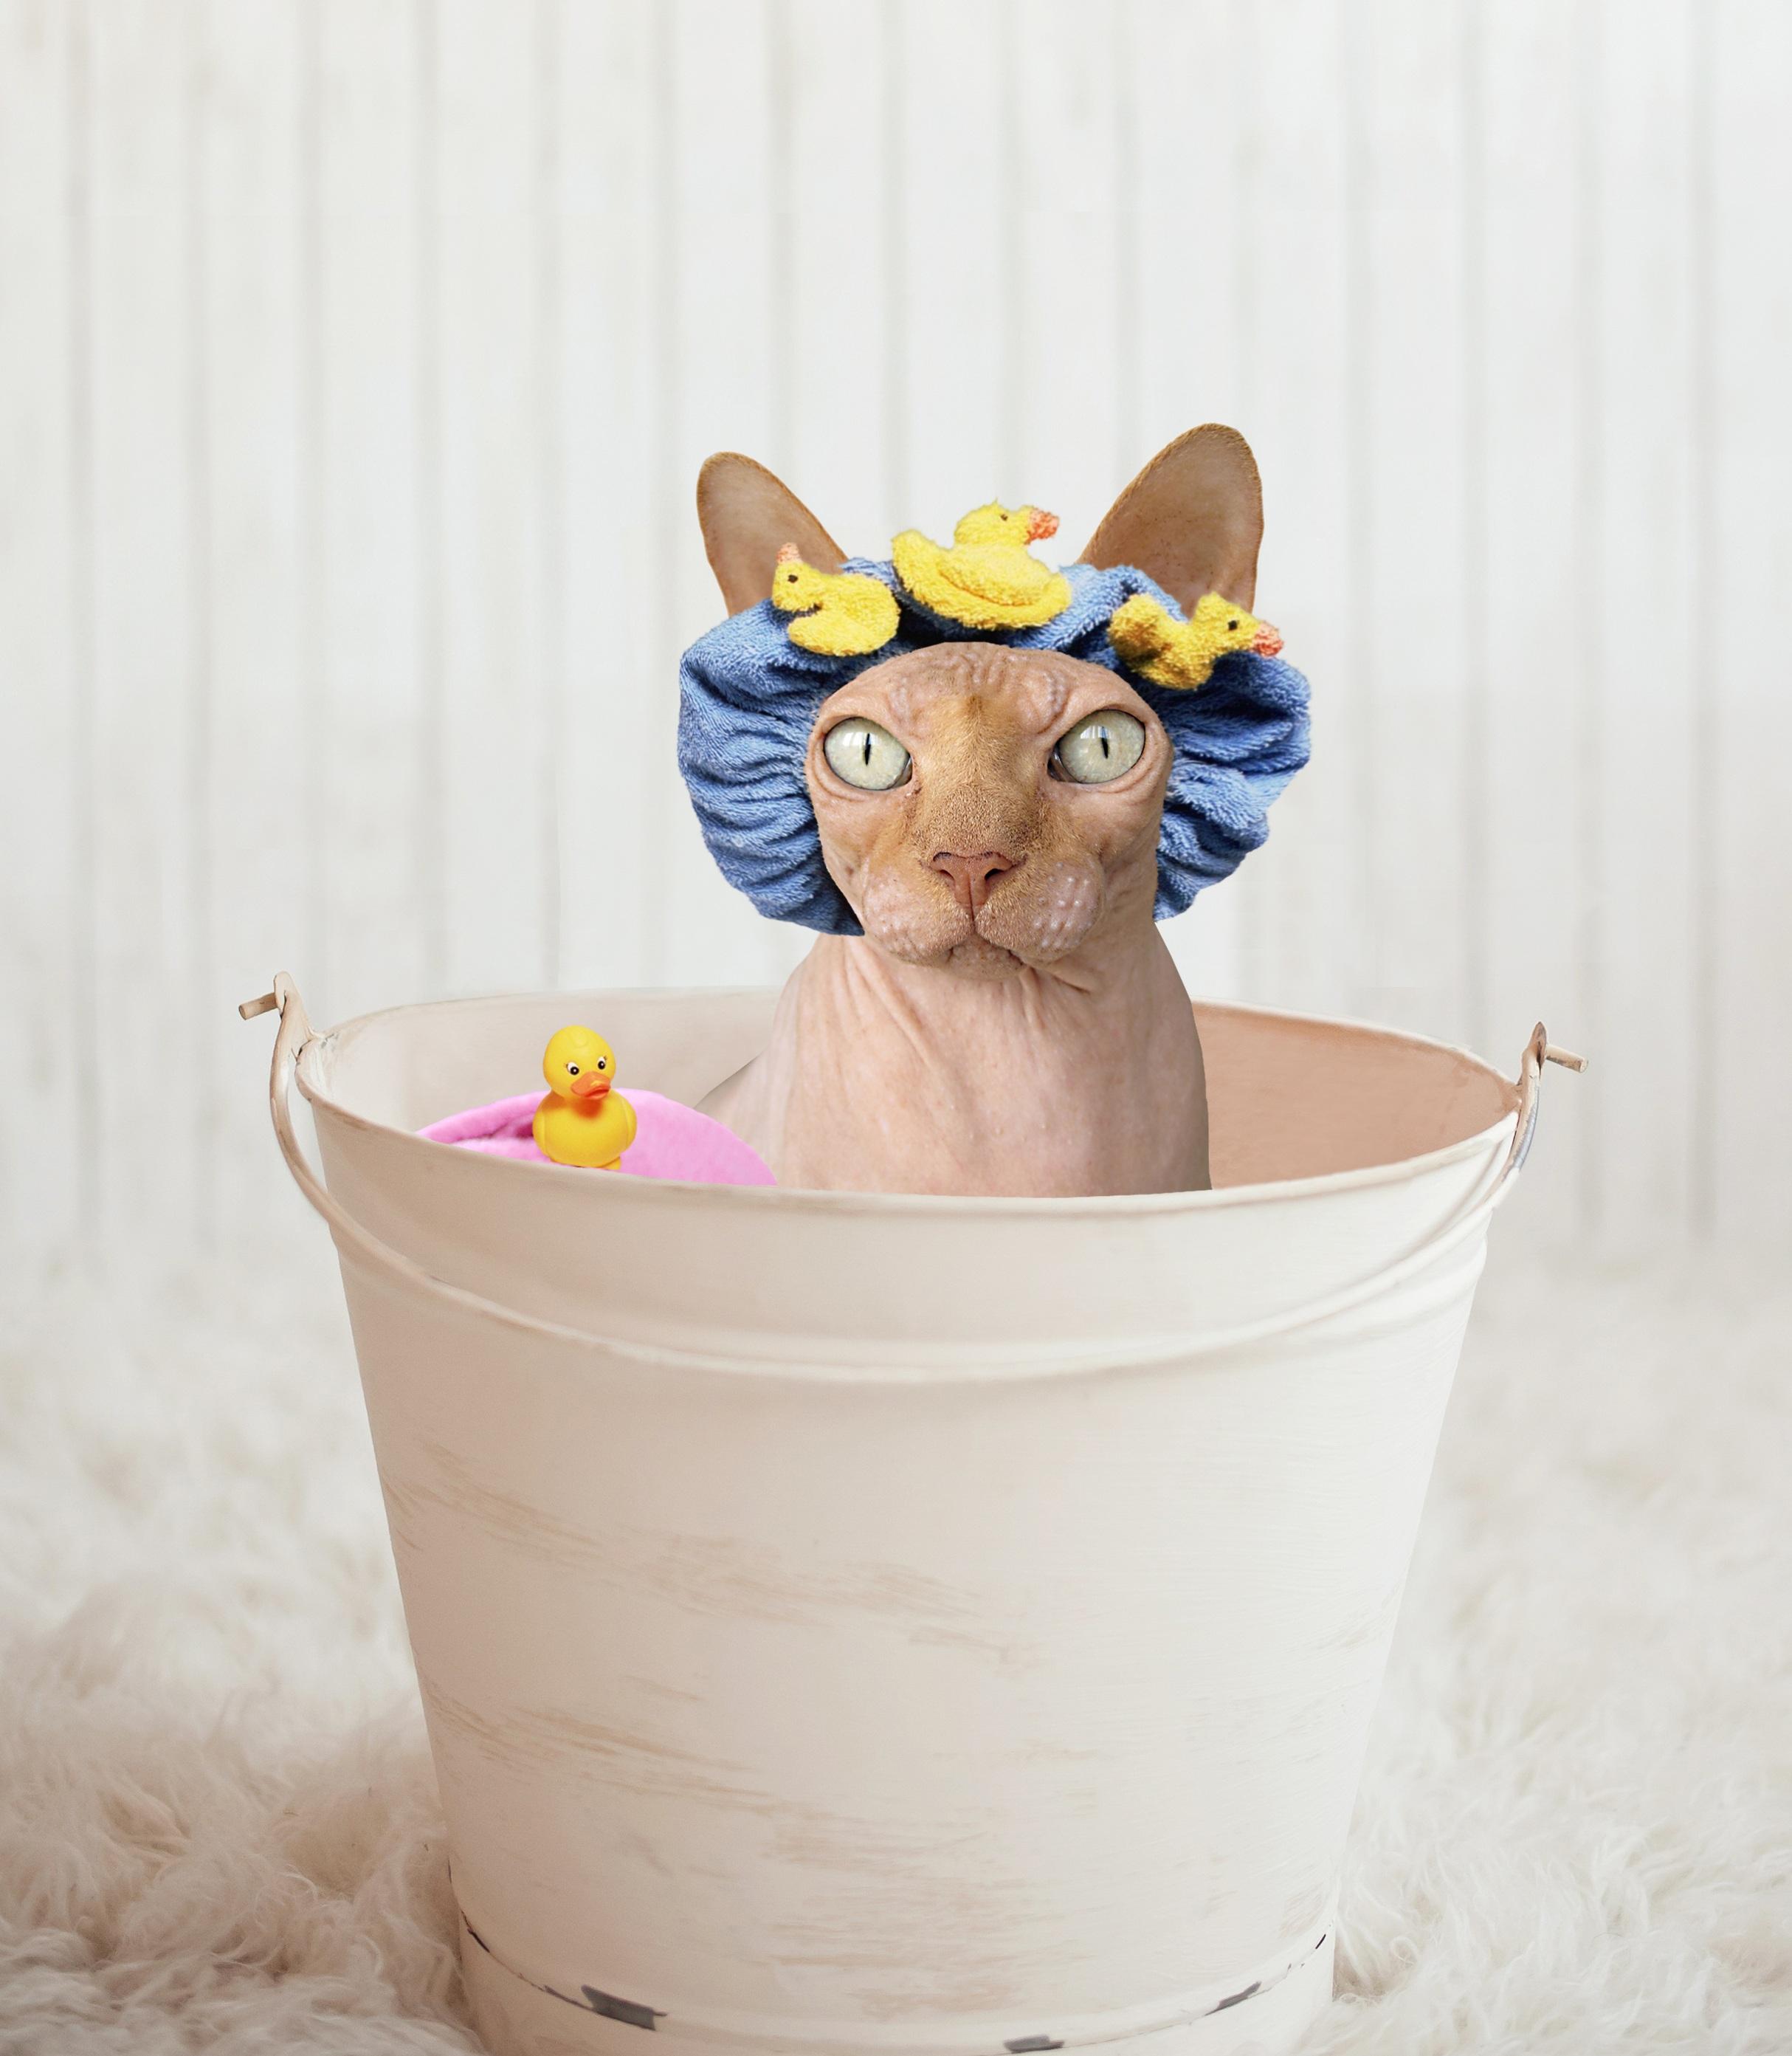 Gambar Basah Imut Potret Anak Kucing Licik Ember Bak